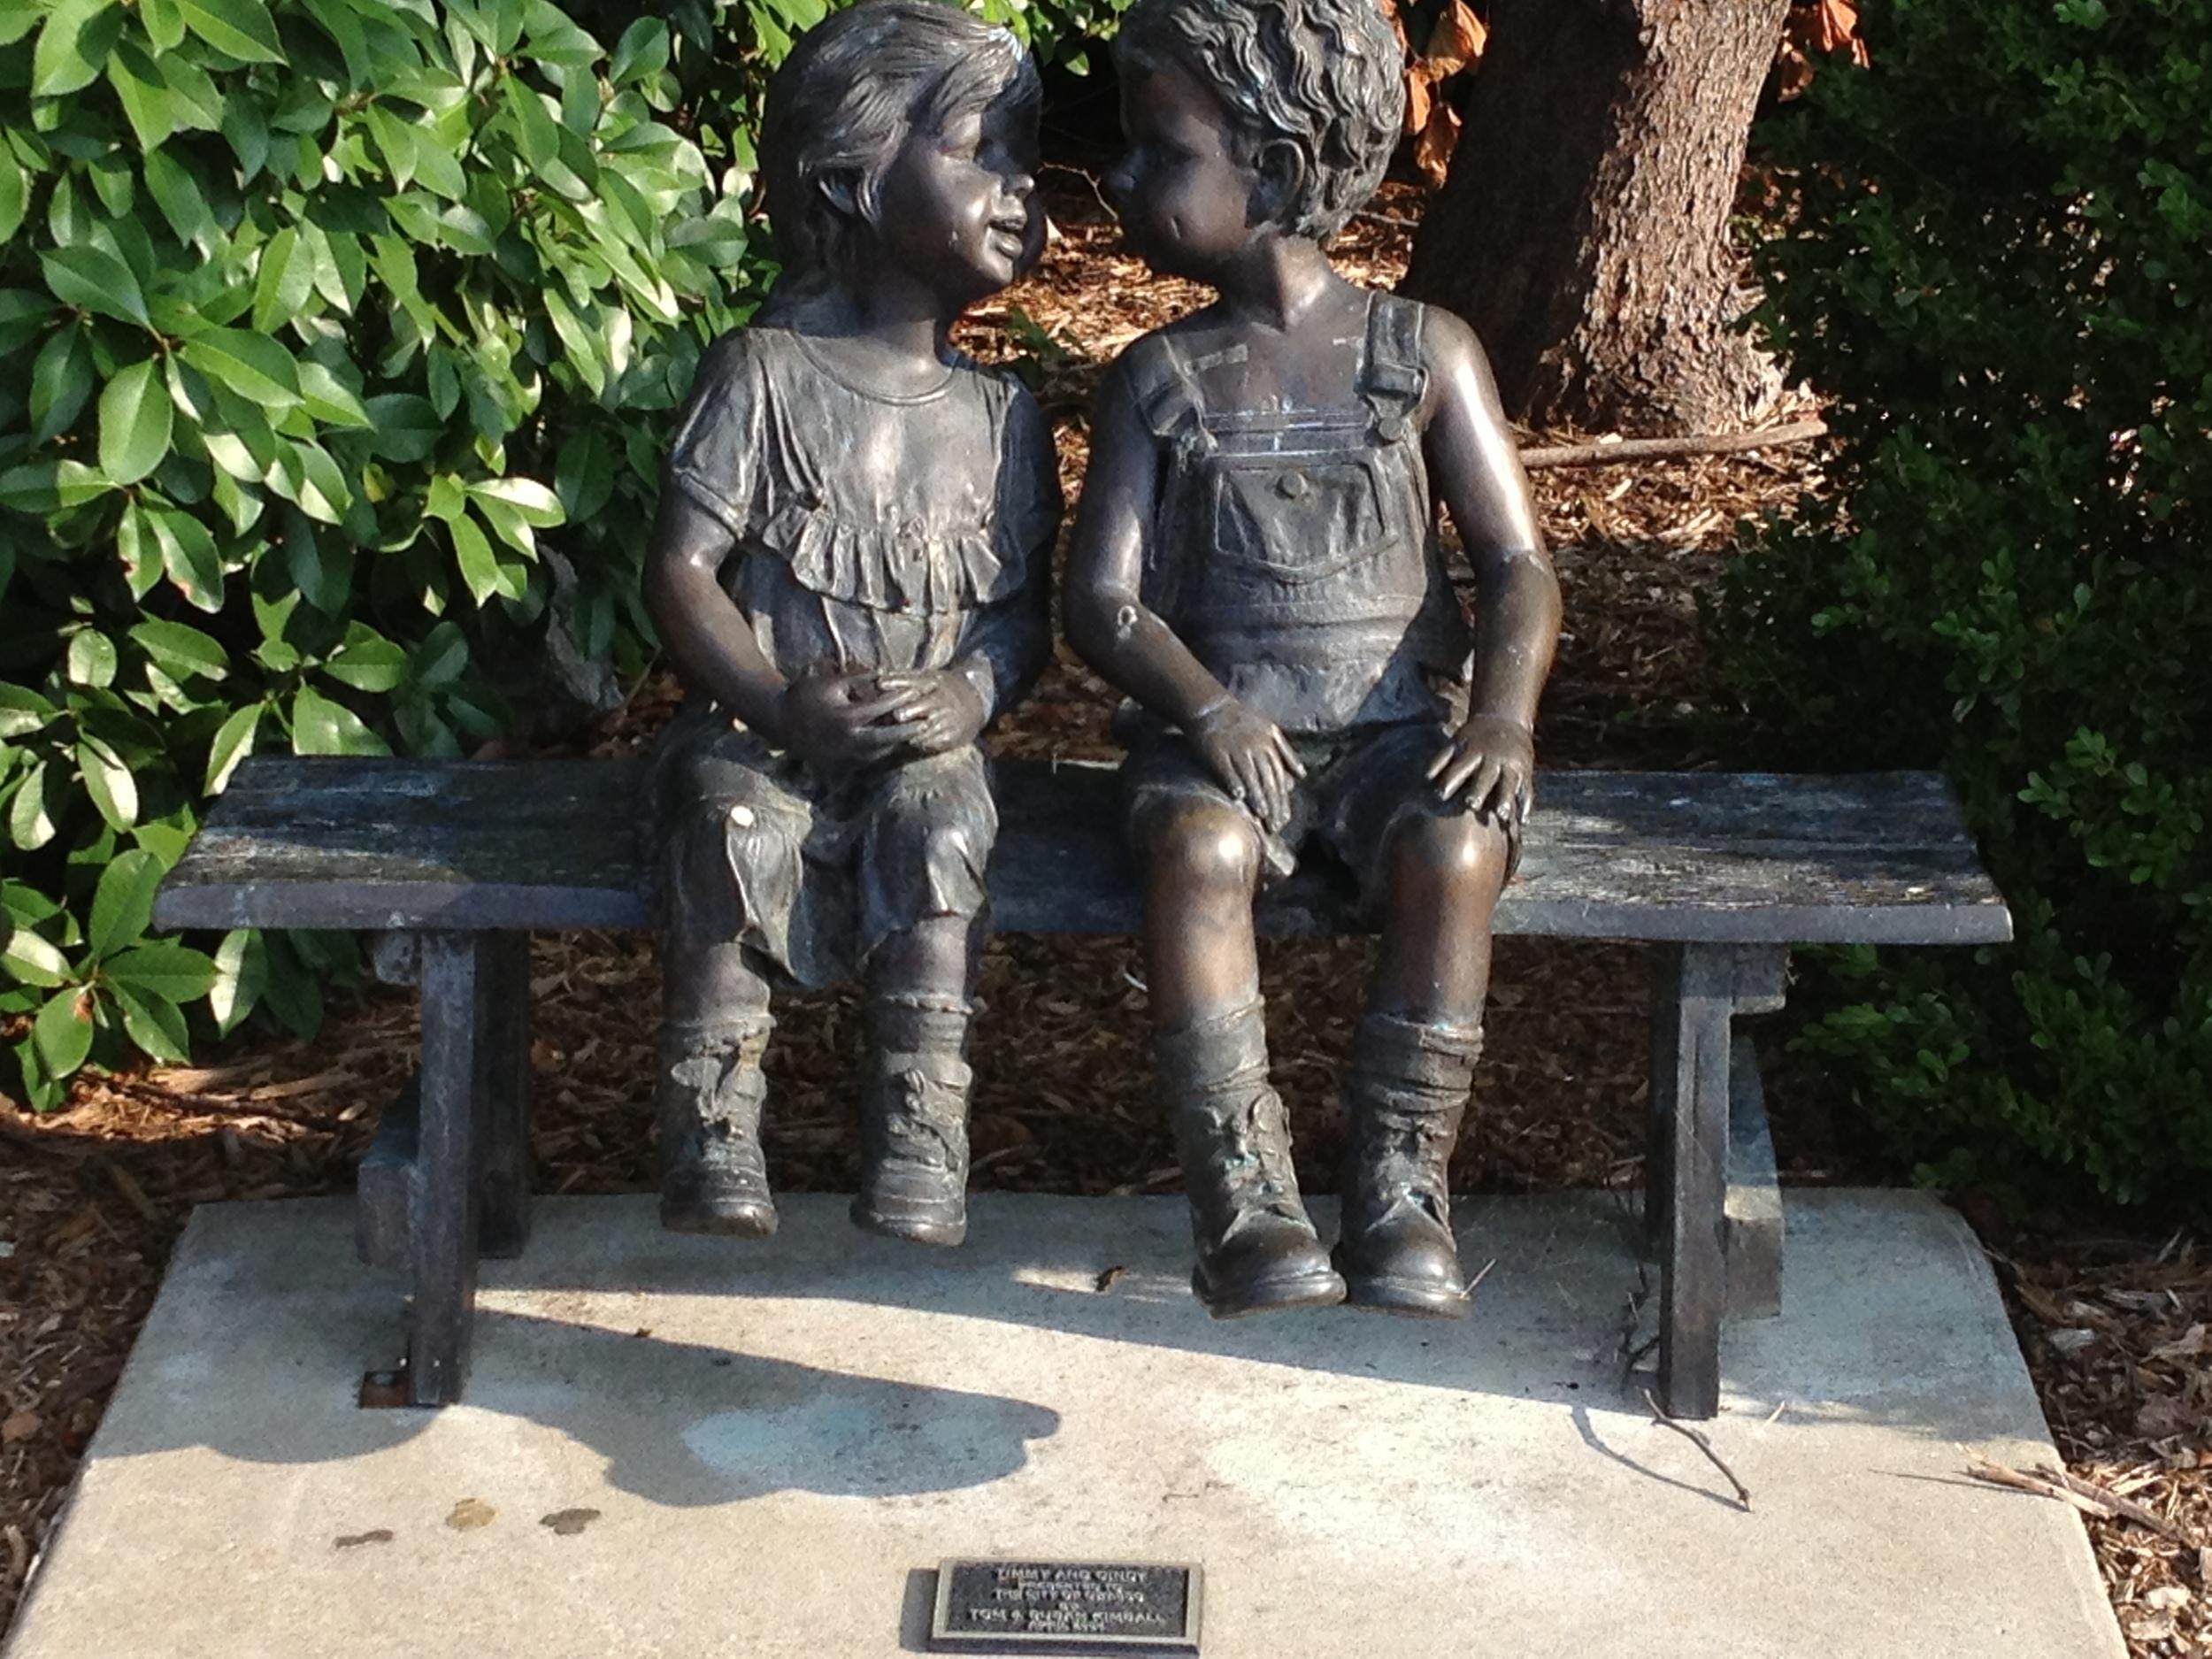 Sculptures by Owasso Jail